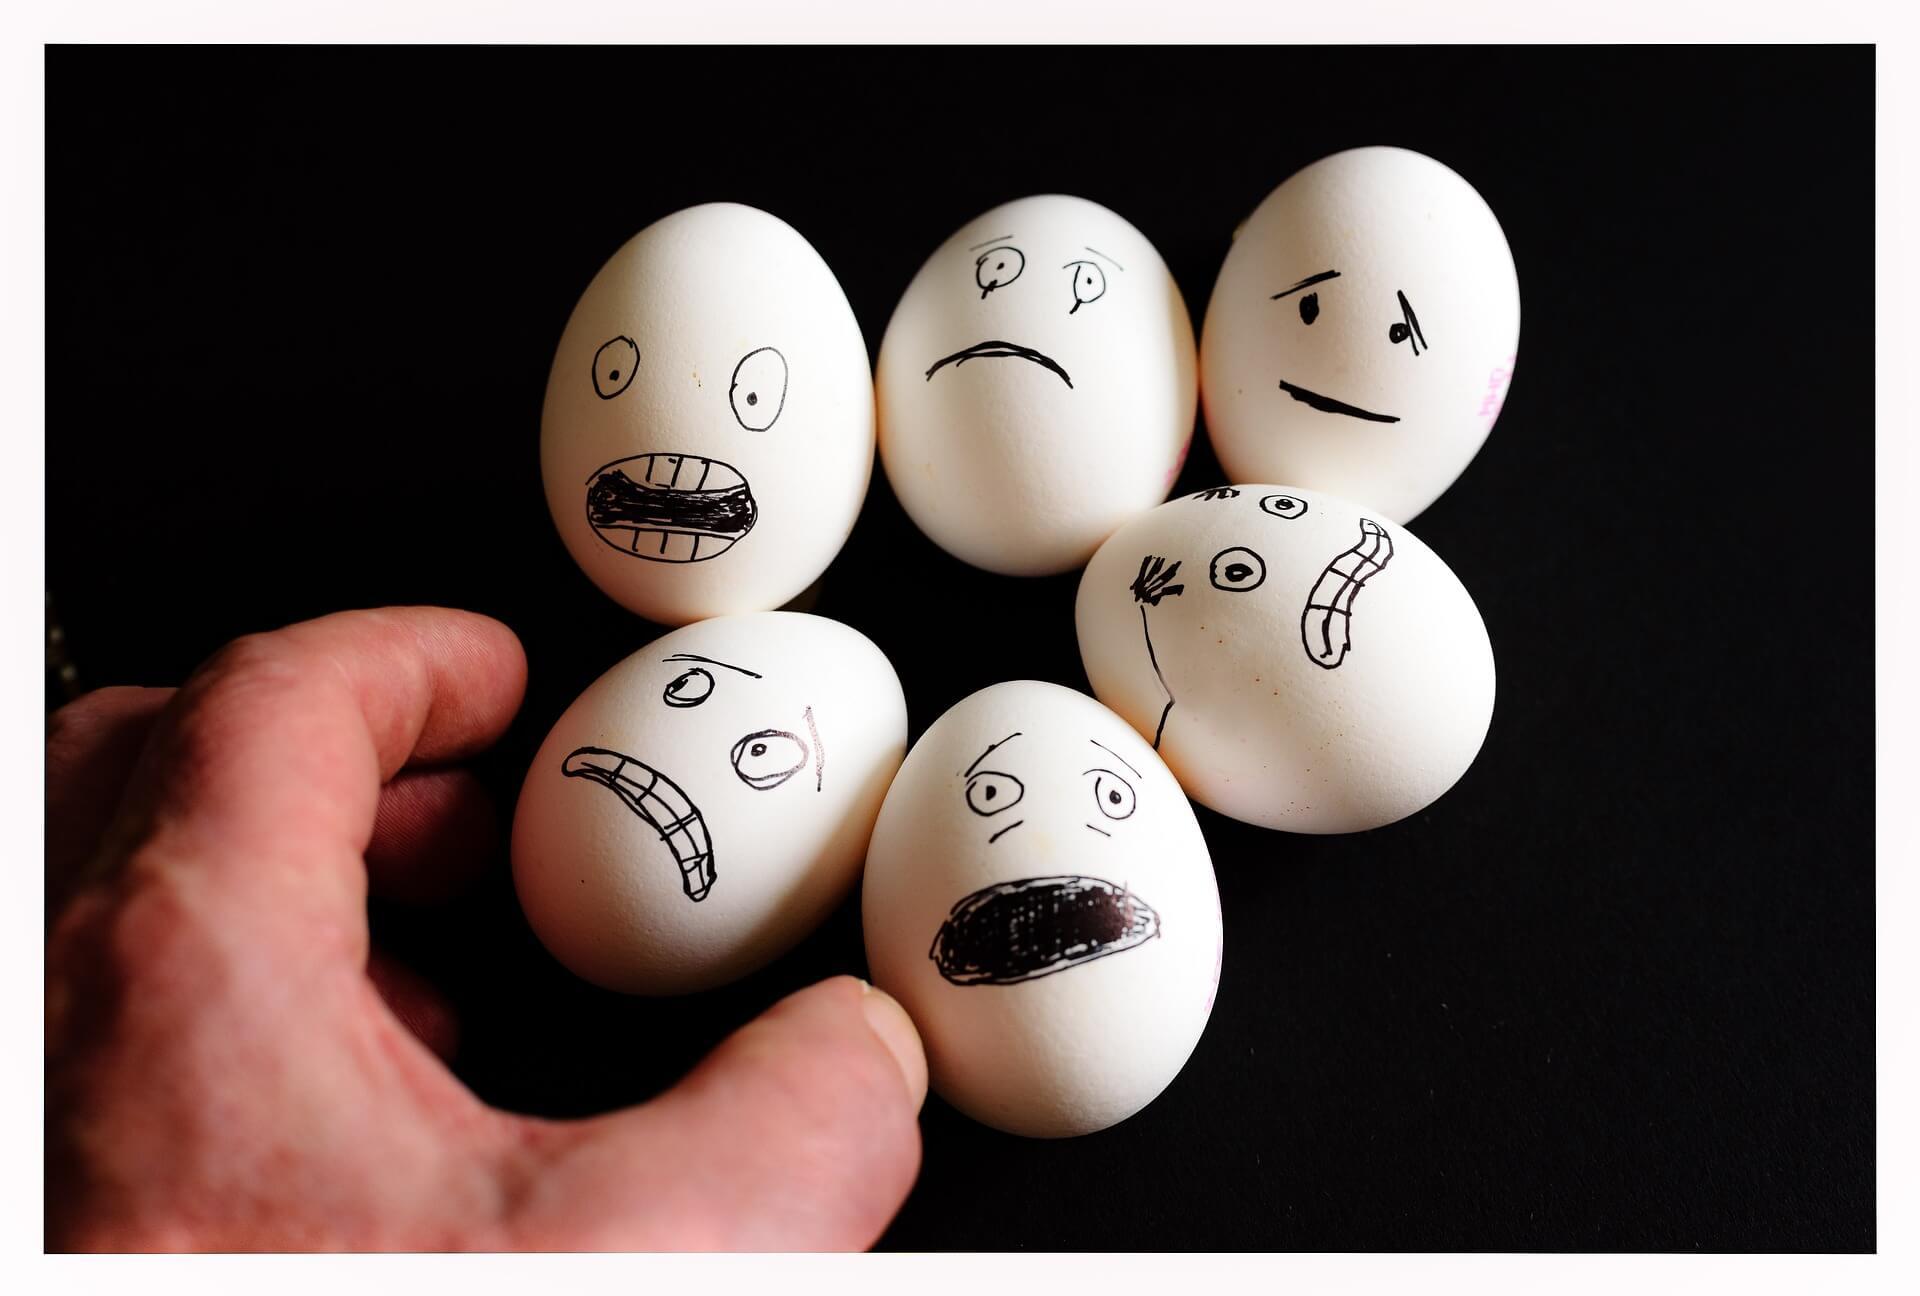 scared-eggs-2939061_1920